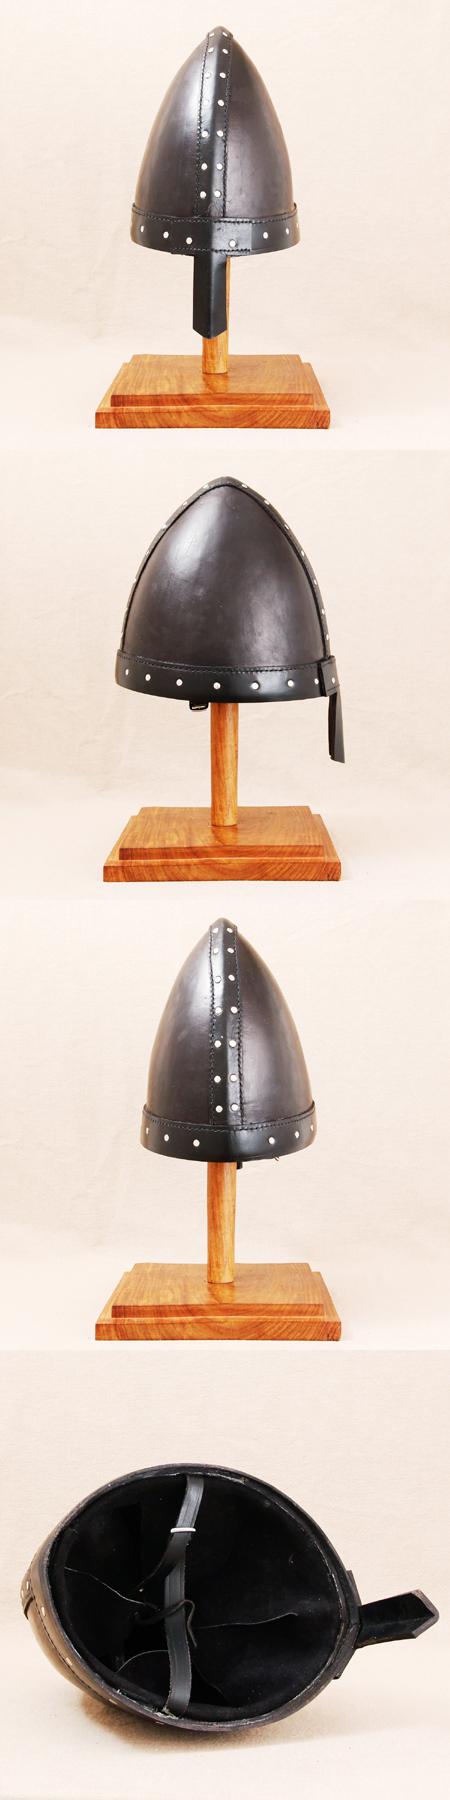 Helm der Wikinger, Normannen, aus Rindsleder